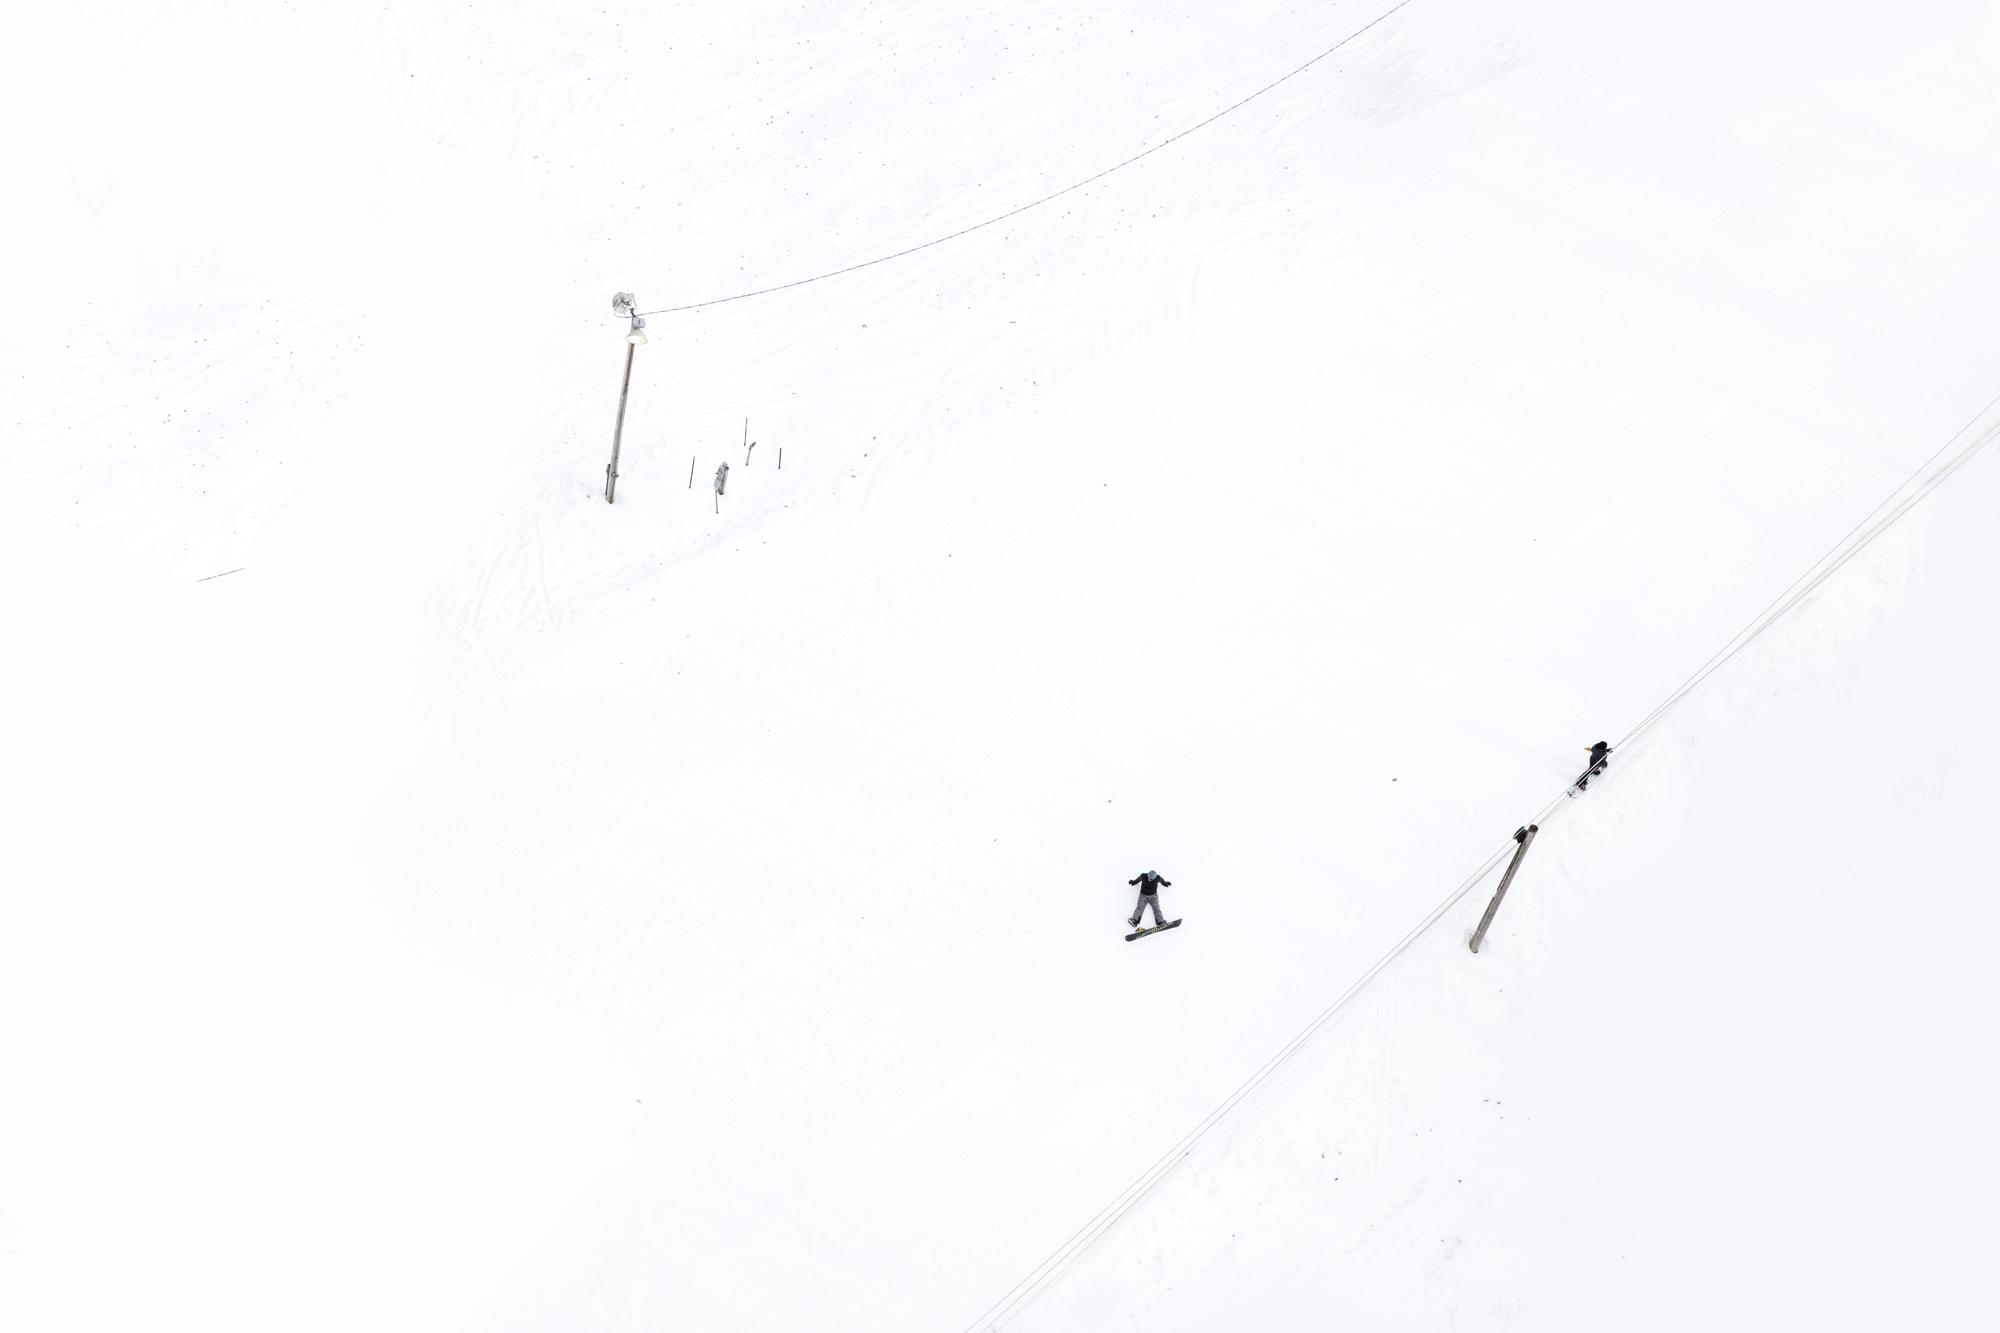 Winter Aerial in , , on Saturday, February 6, 2019. Photo by Jenn Ackerman@ackermangruber